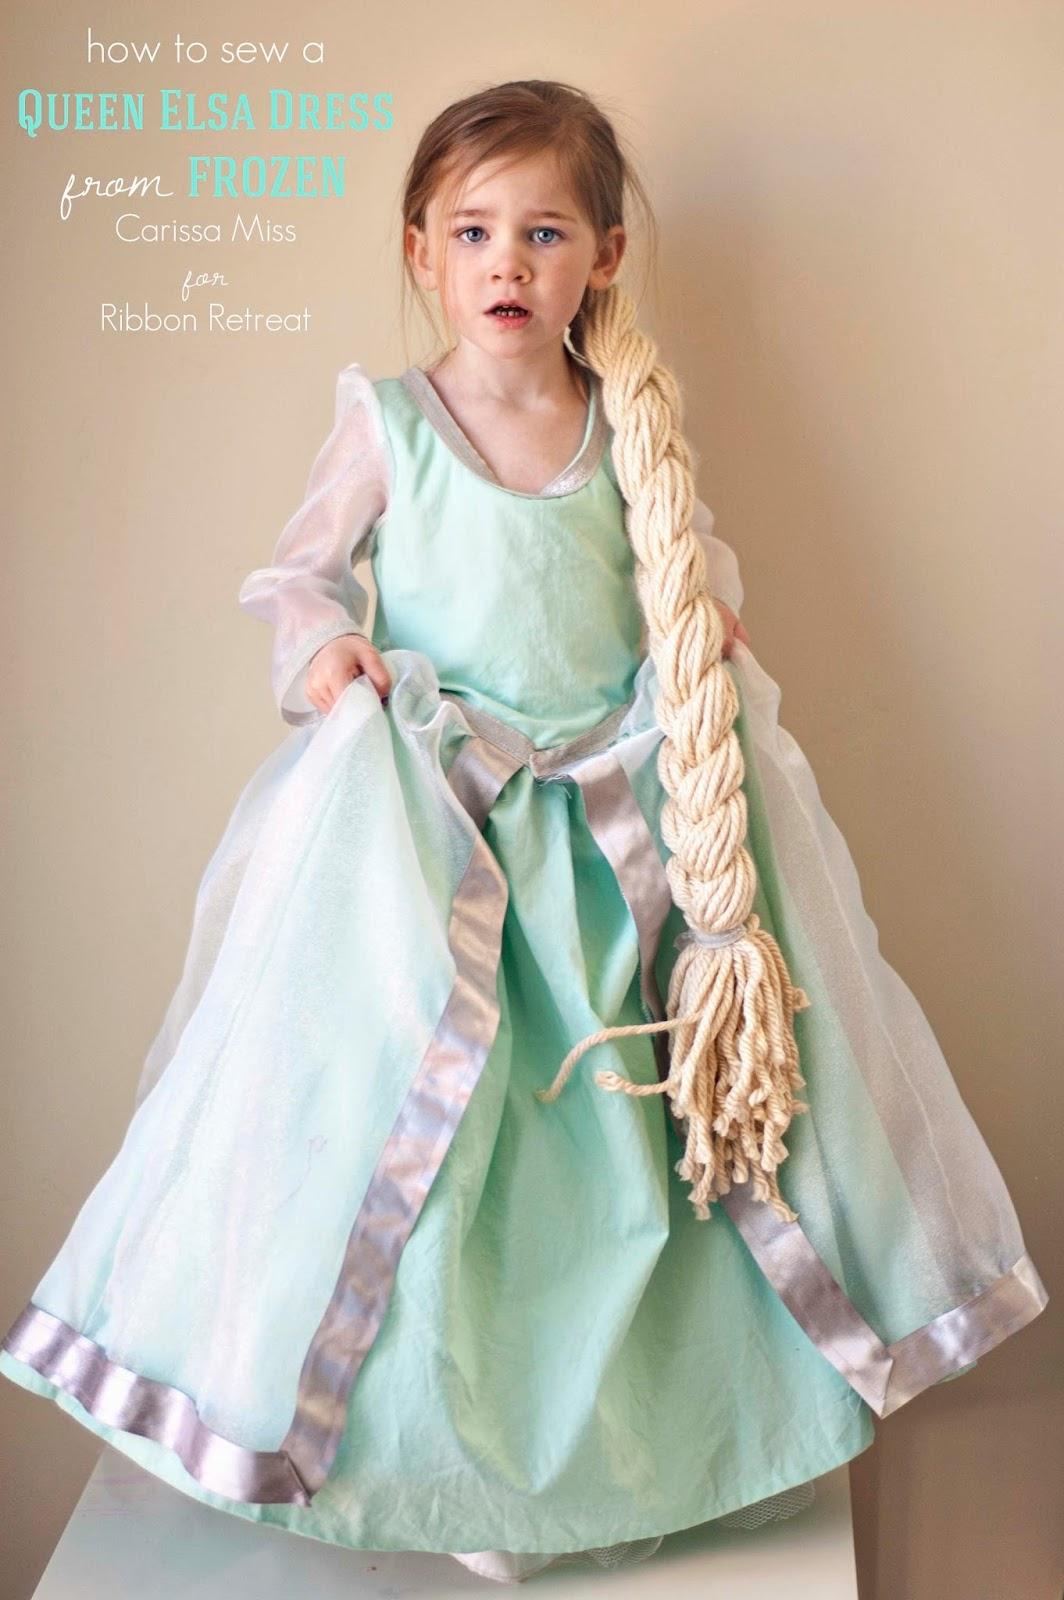 Carissa Miss: How to sew a Disney Frozen Elsa Dress